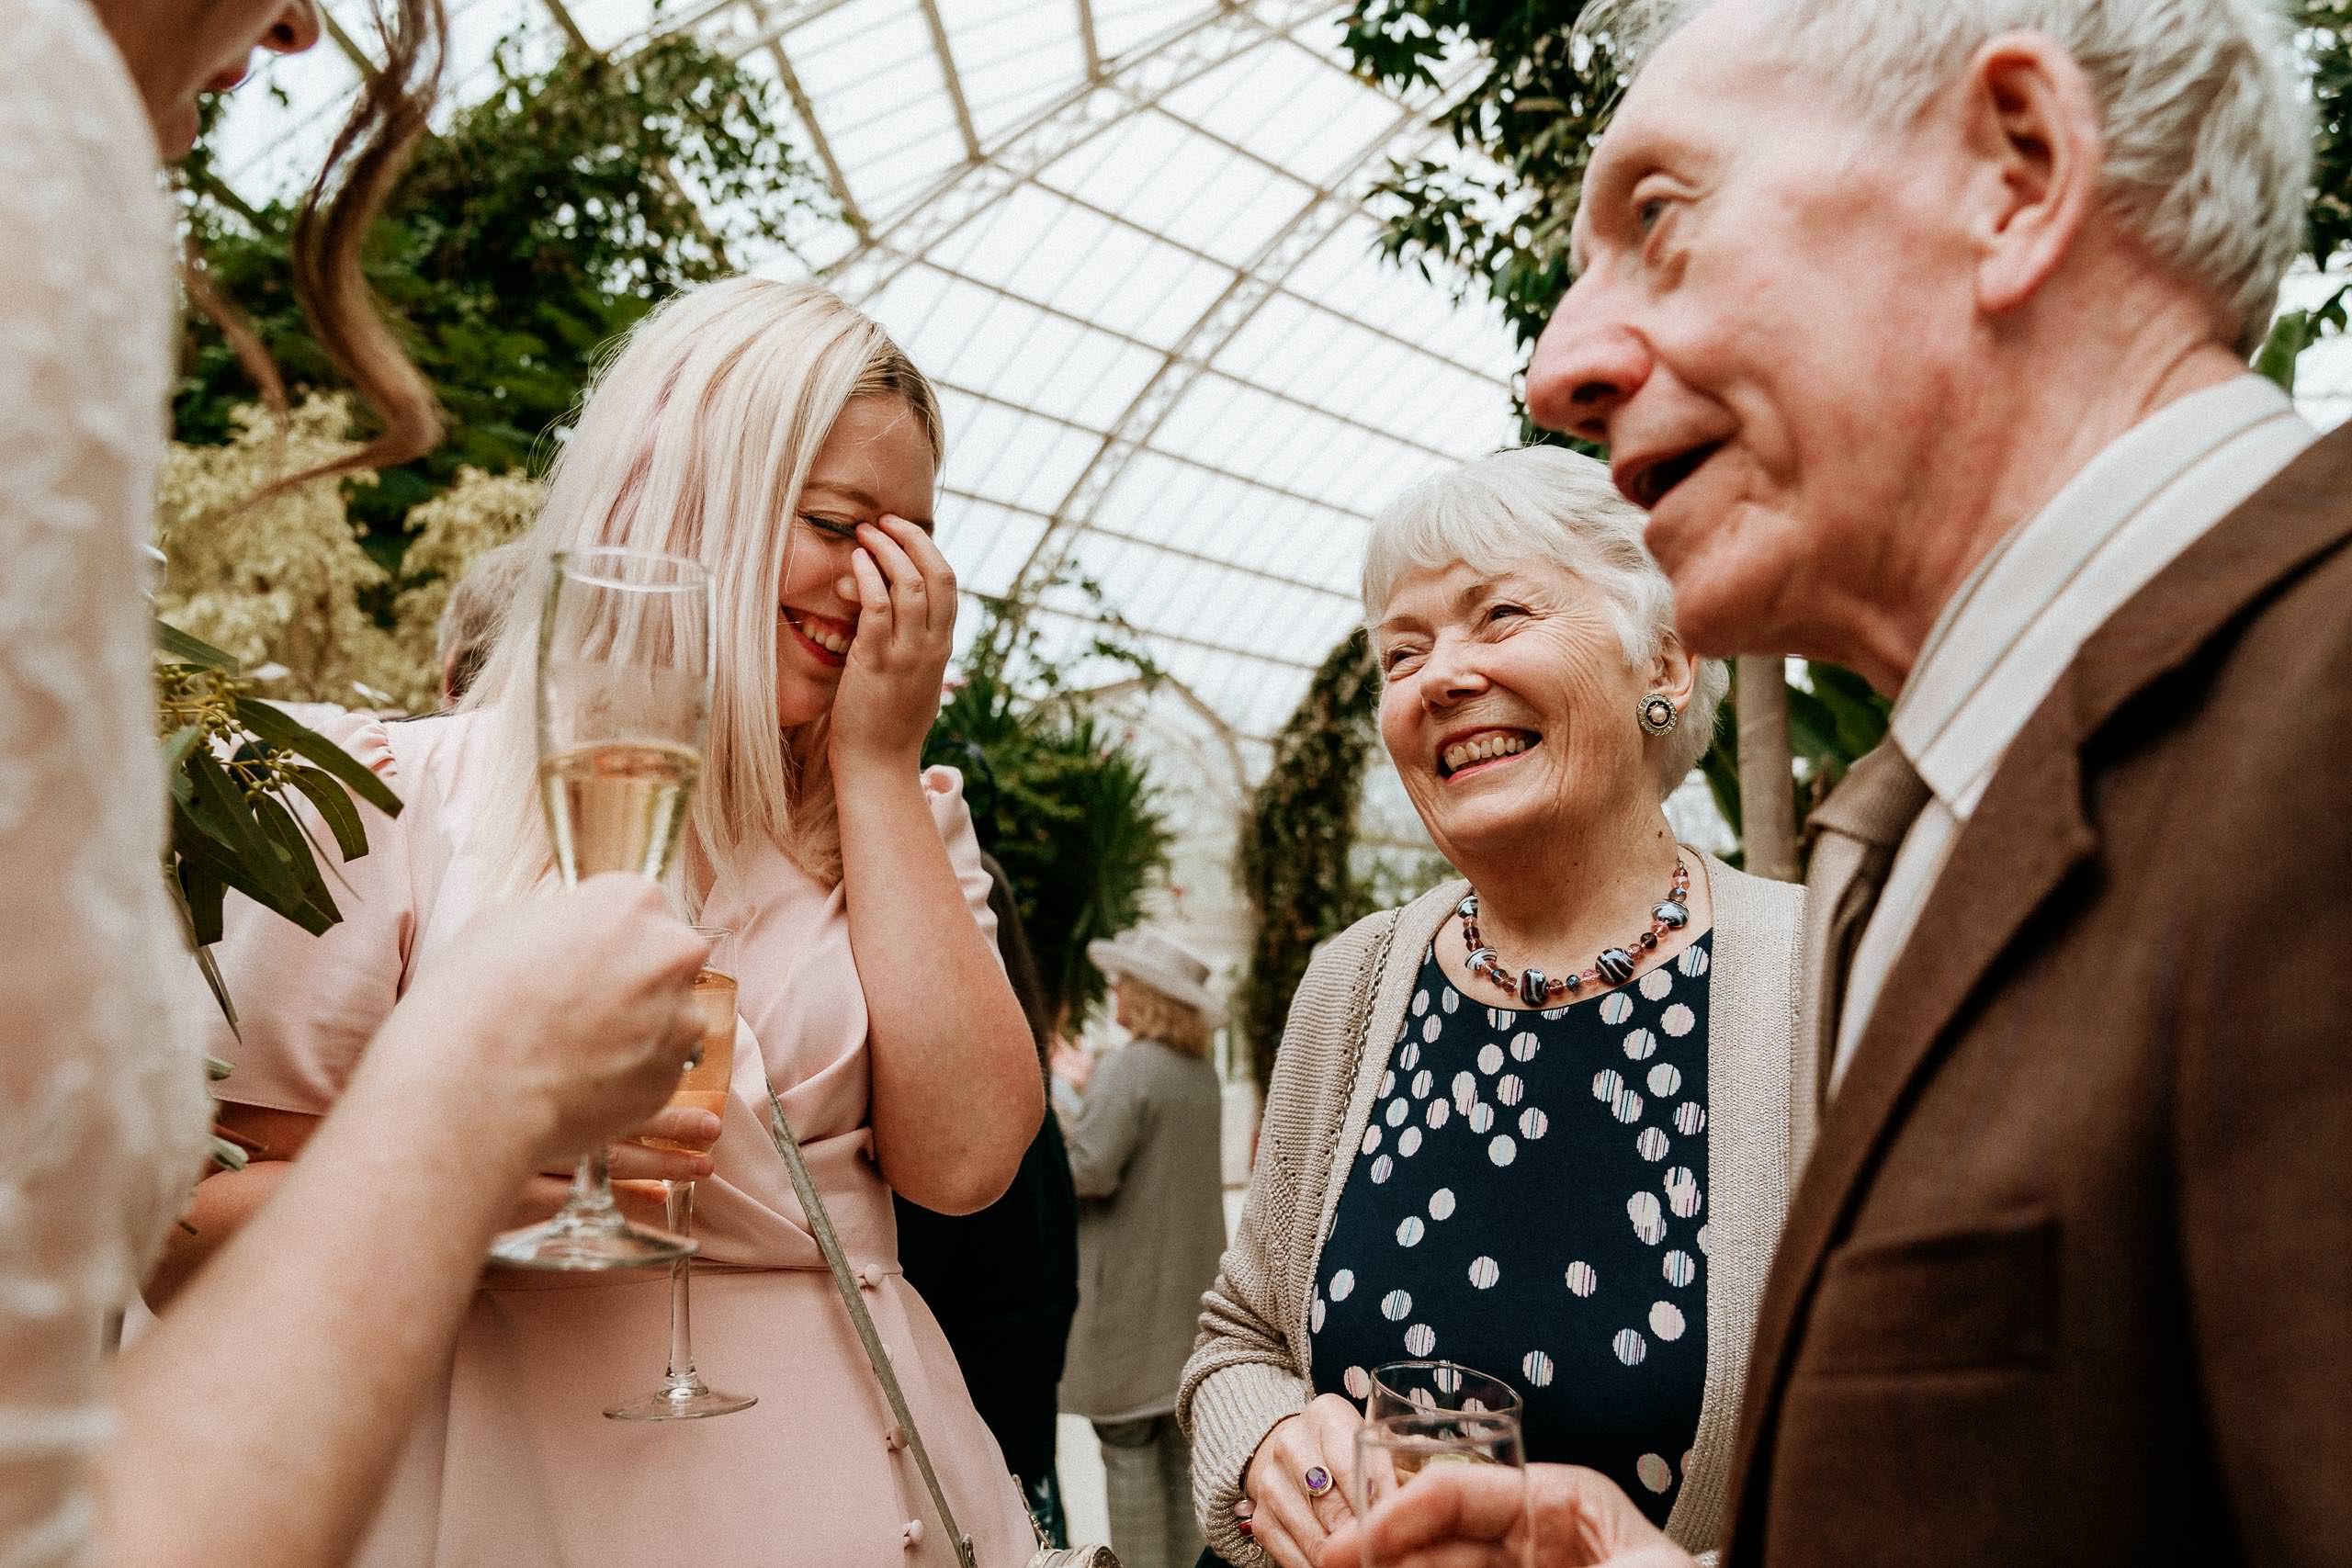 wedding guest cringing